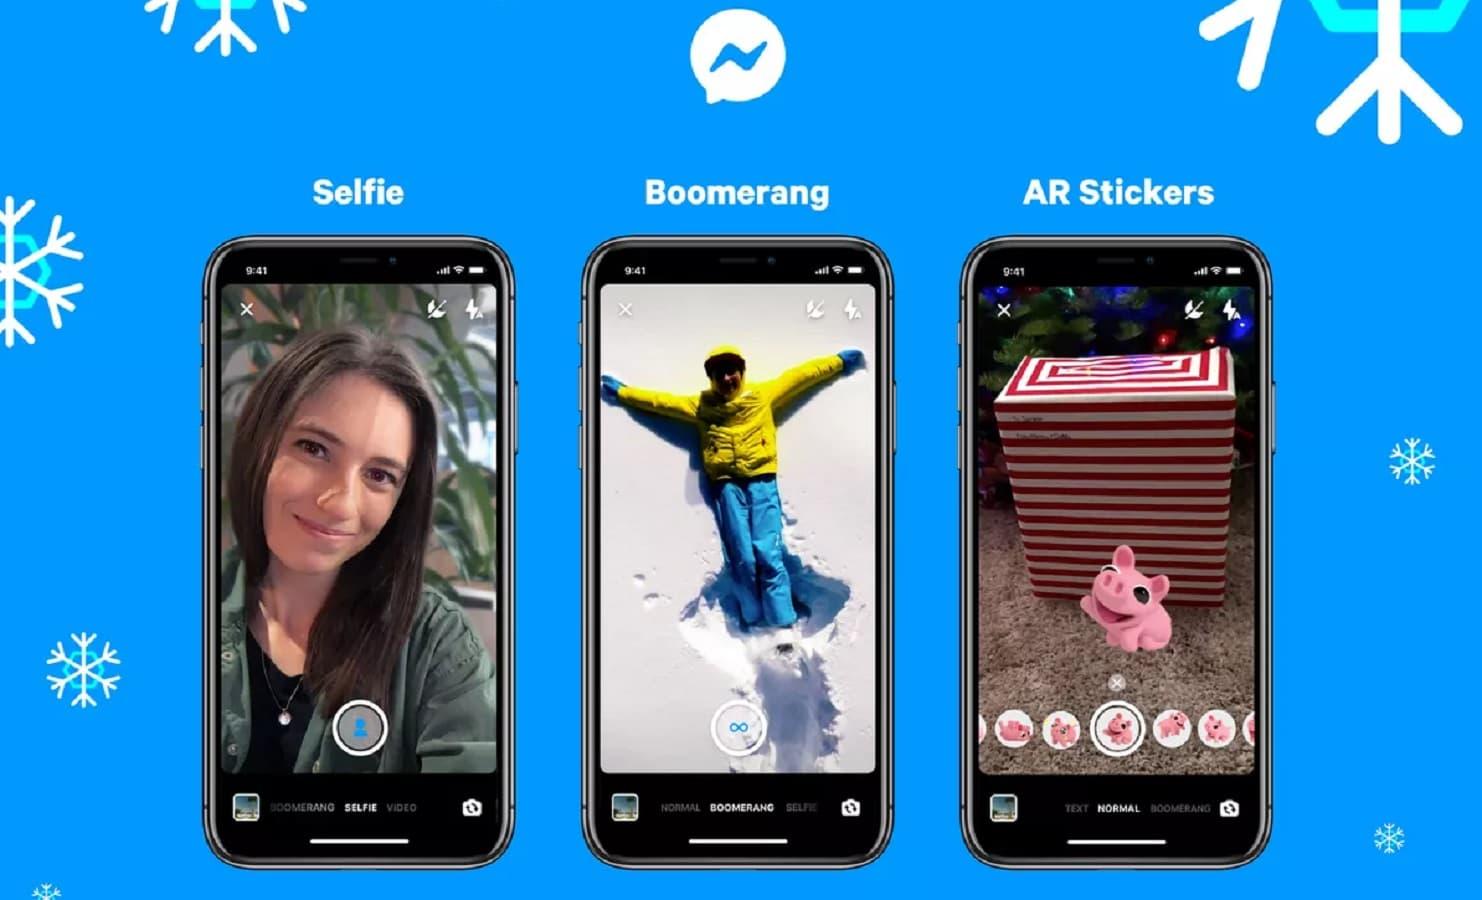 new facebook messenger features include selfie mode